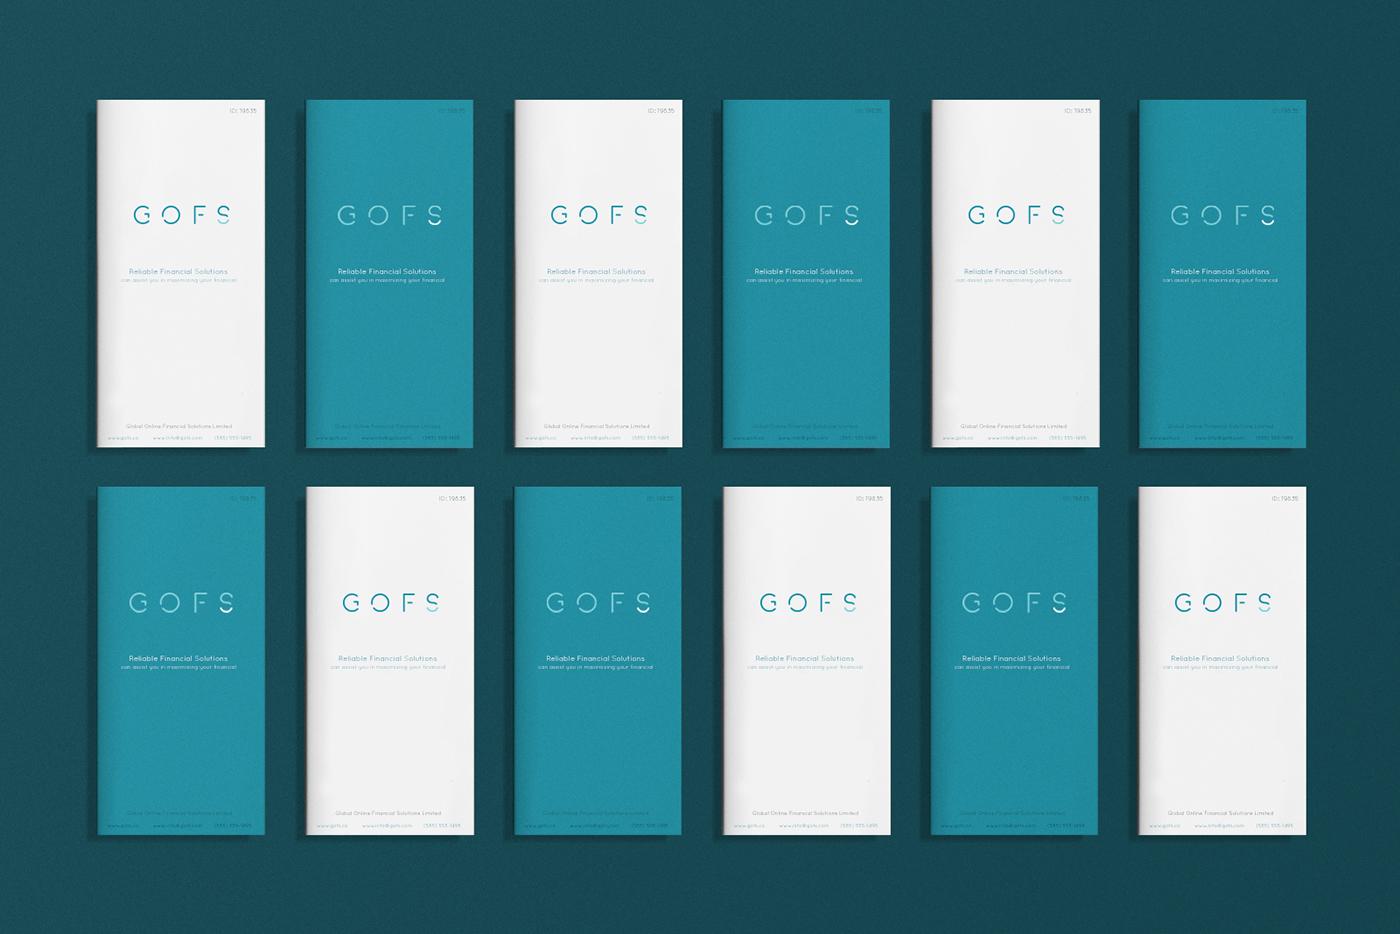 Global Online Financial 环球在线金融品牌视觉VI设计欣赏-VI设计公司9